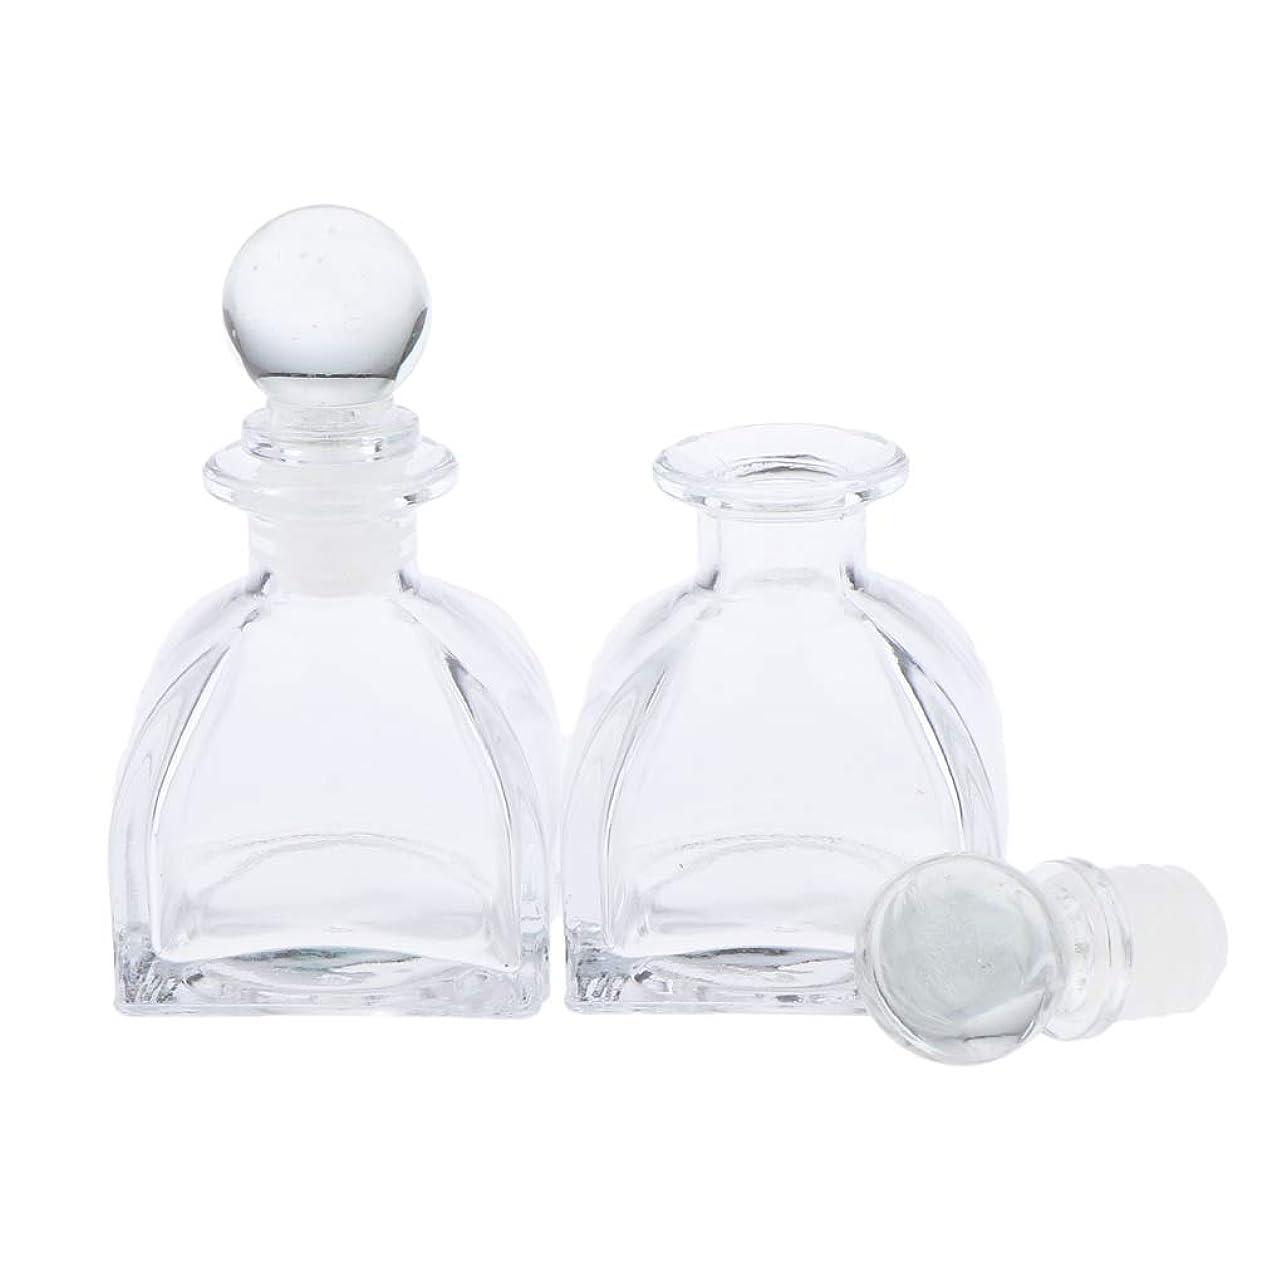 Perfeclan 2個 全3サイズ 香水ディフューザーボトル ガラスボトル 透明 ローション 化粧品適用 DIY 交換 - 50ミリリットル